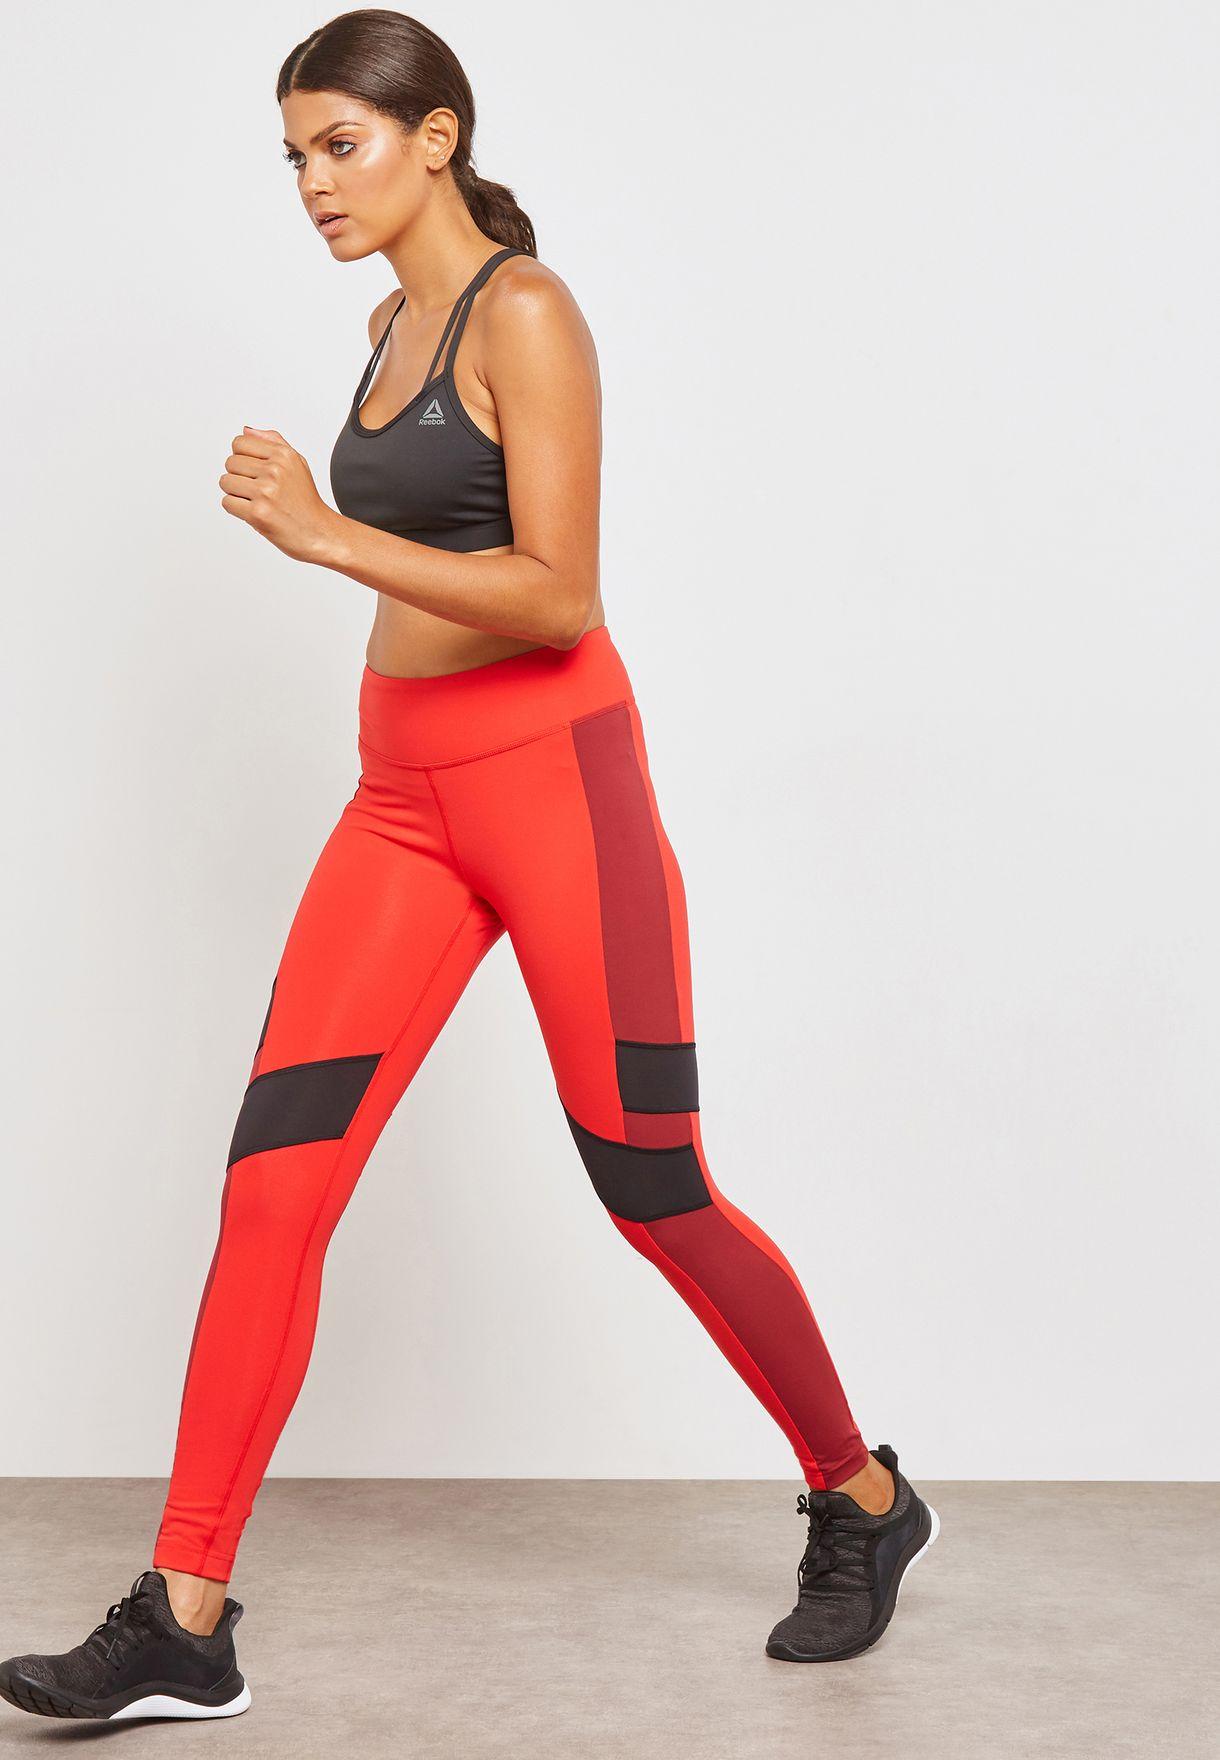 5e4bad48a87c5 Shop Reebok red Lux Leggings CF5867 for Women in UAE - RE019AT93JBA